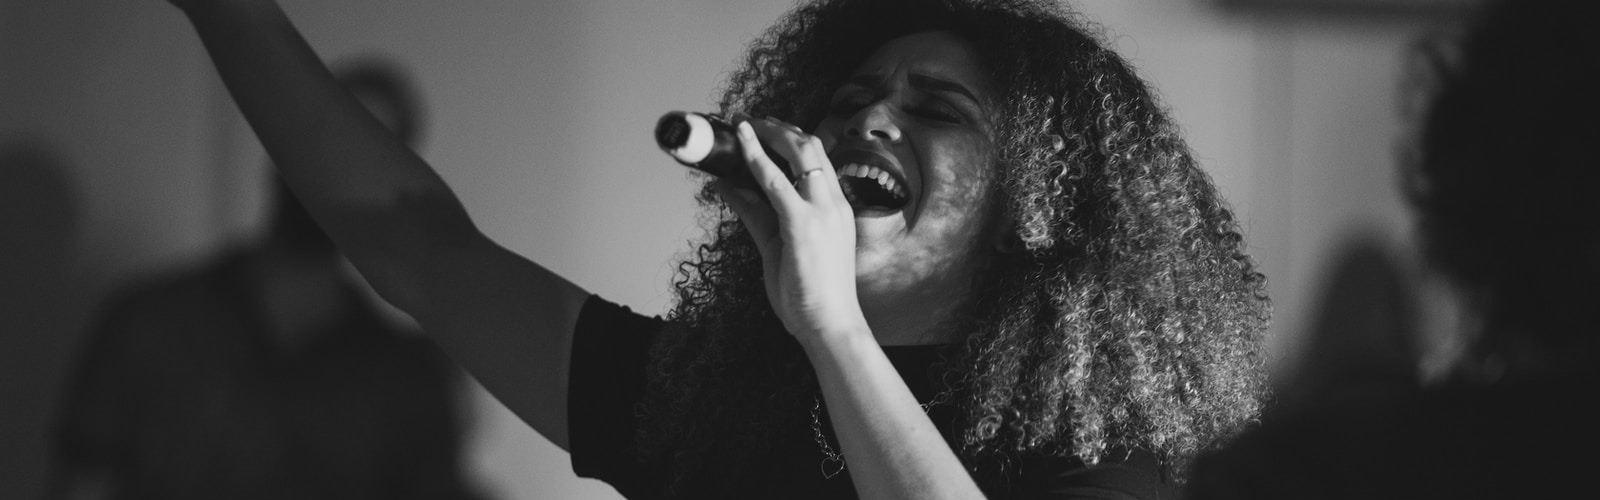 woman in black tank top singing